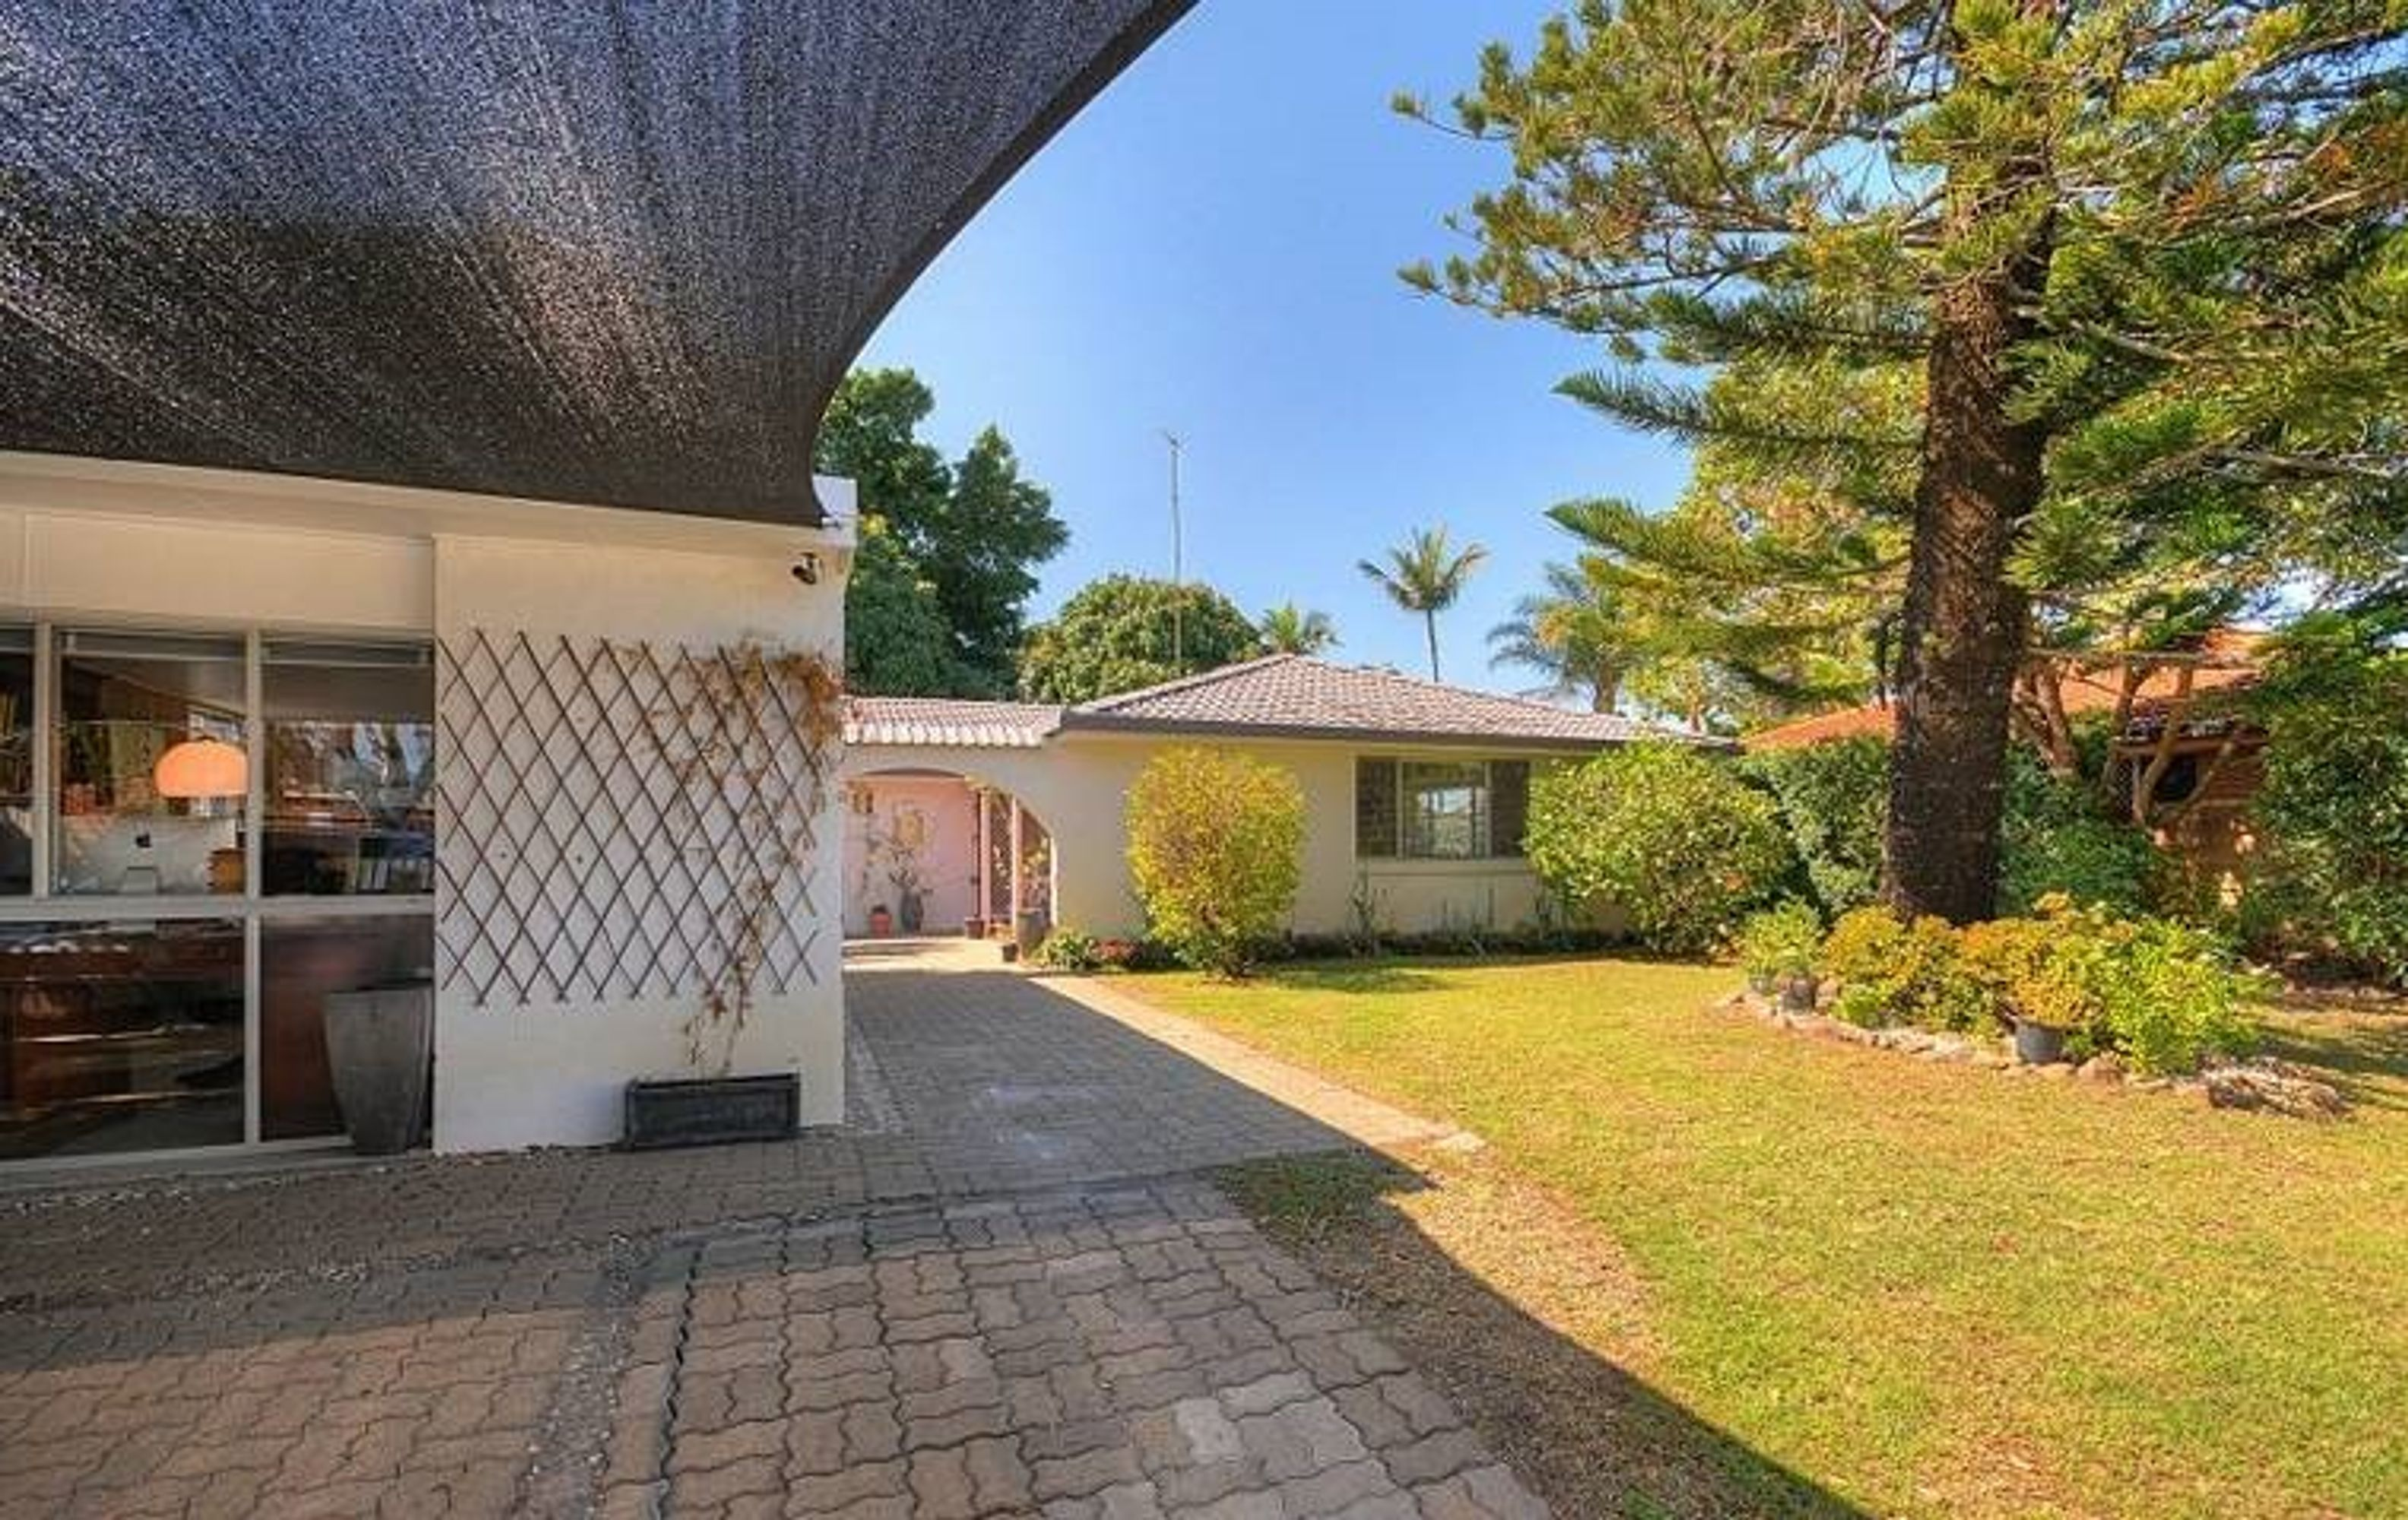 122 Sunshine Blvd, Mermaid Waters, QLD 4218